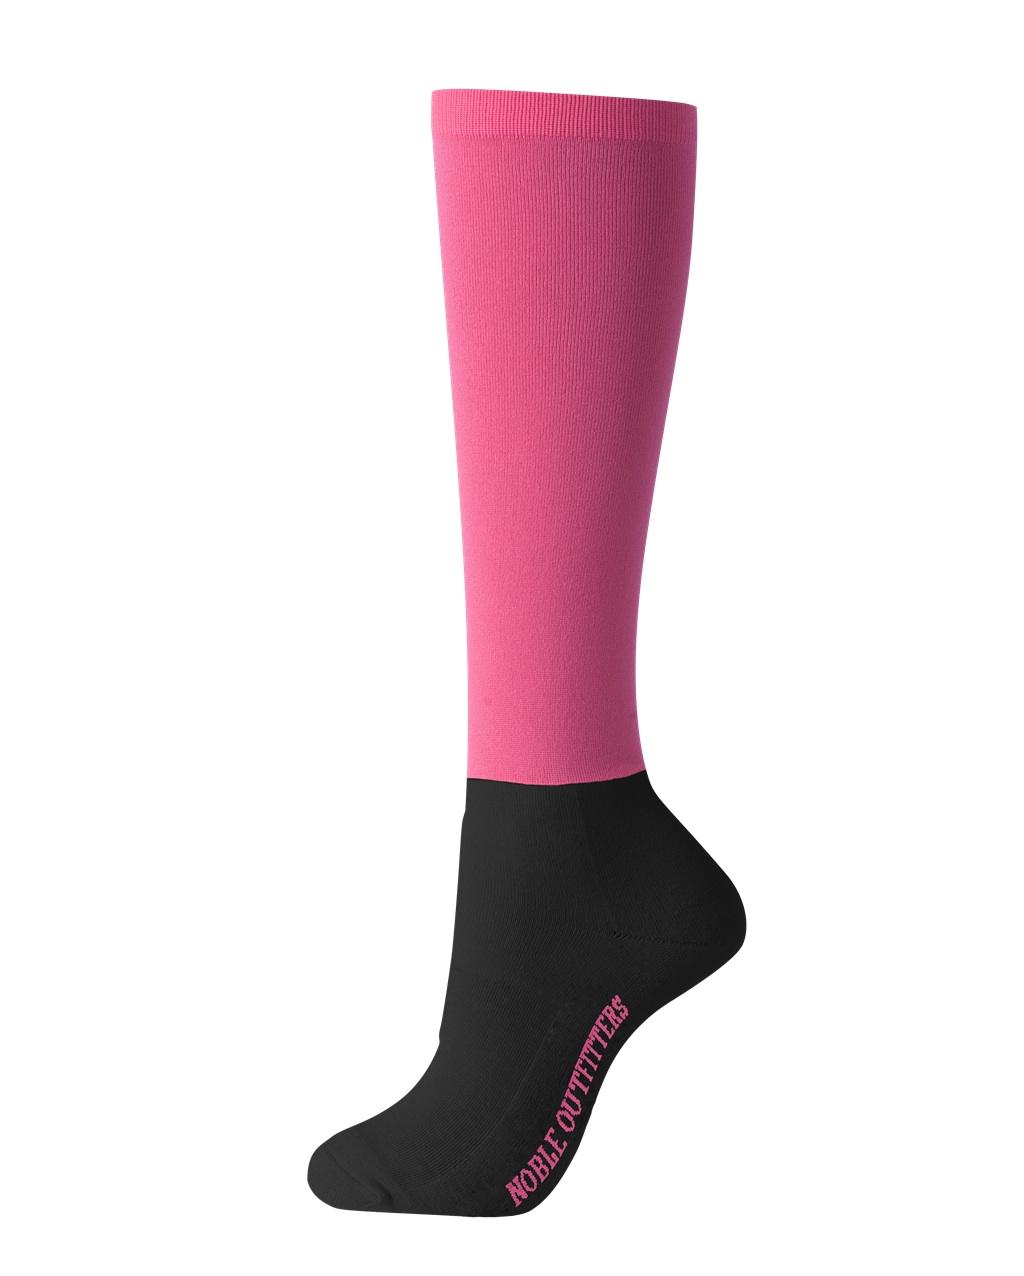 Womens Peddies - Flamingo